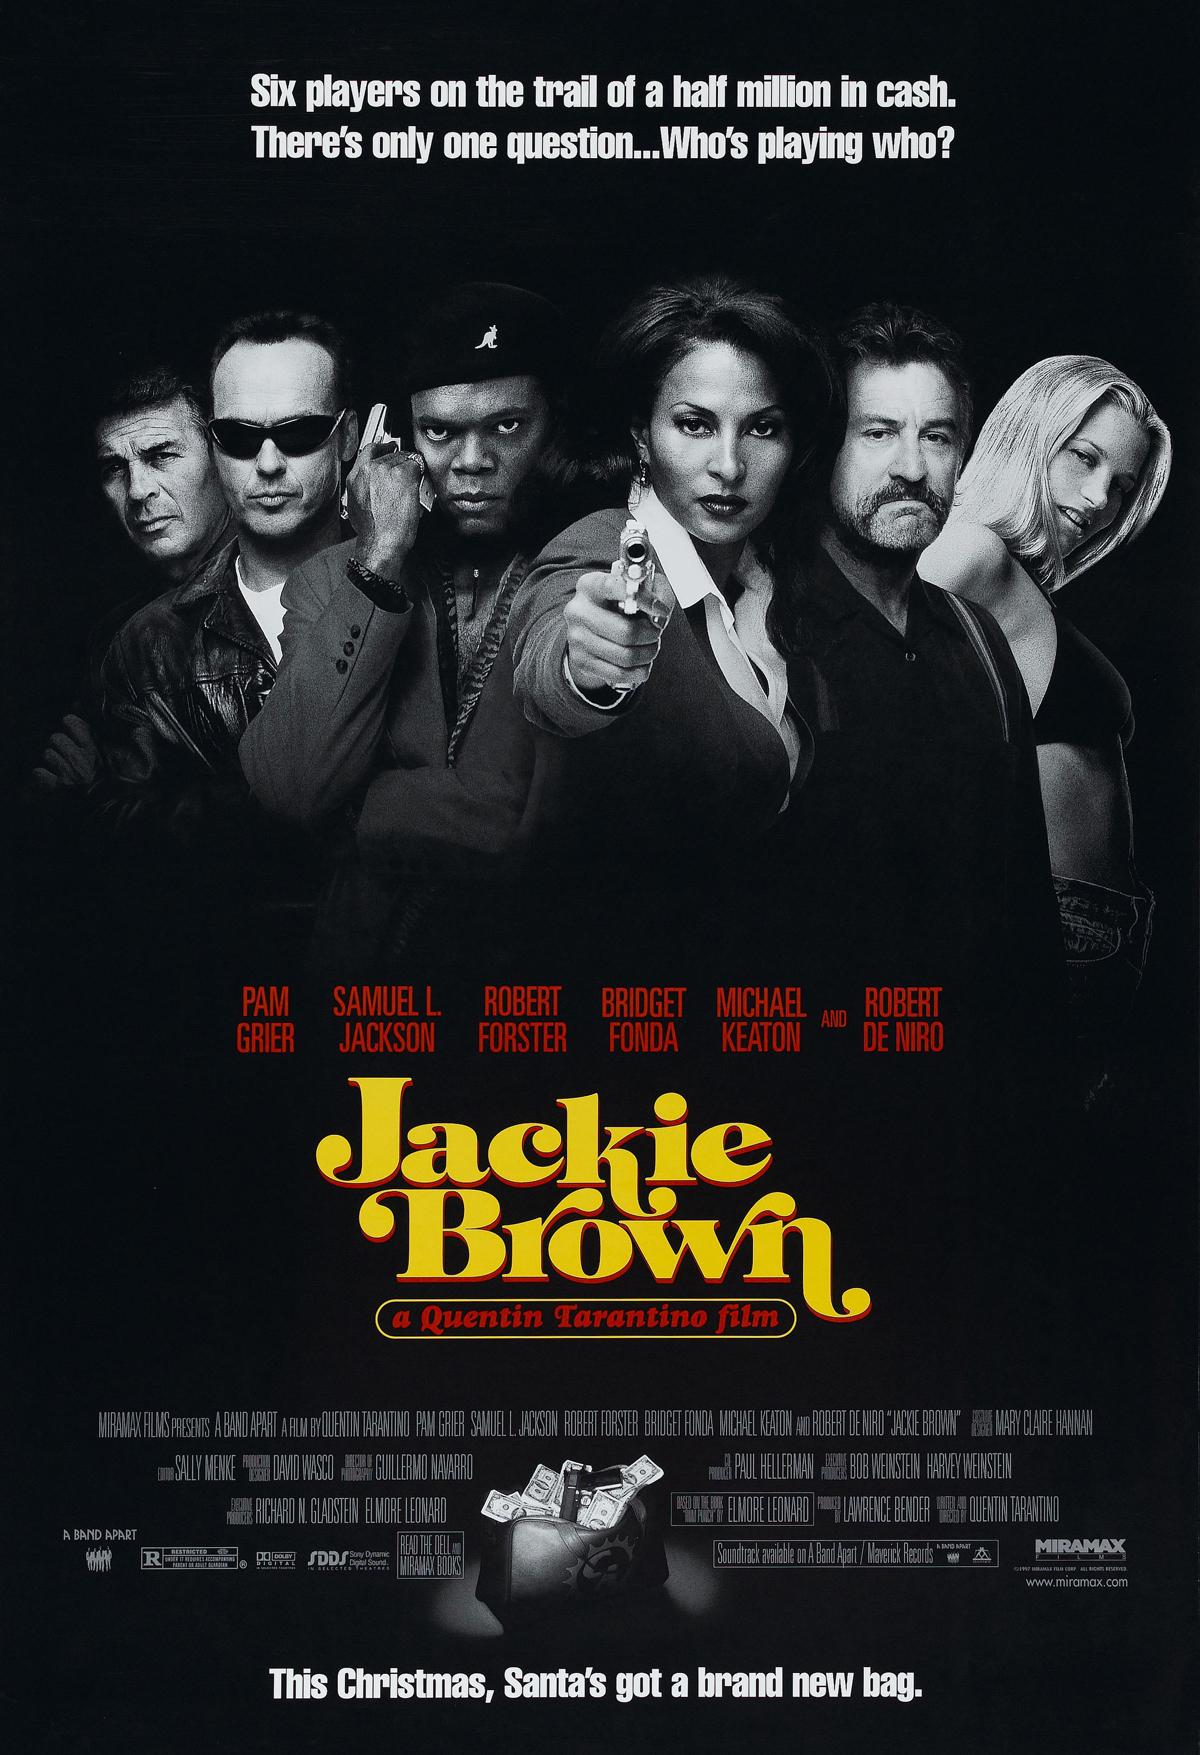 Jackie Brown (1997) - Directed By: Quentin TarantinoStarring: Pam Grier, Samuel L. Jackson, Robert Forster, Bridget Fonda, Michael Keaton, Robert De Niro, Chris TuckerRated: RRun Time: 2h 34mTMM Score: 4 StarsStrengths: Music, Dialogue, Story, CameraWeakness: None